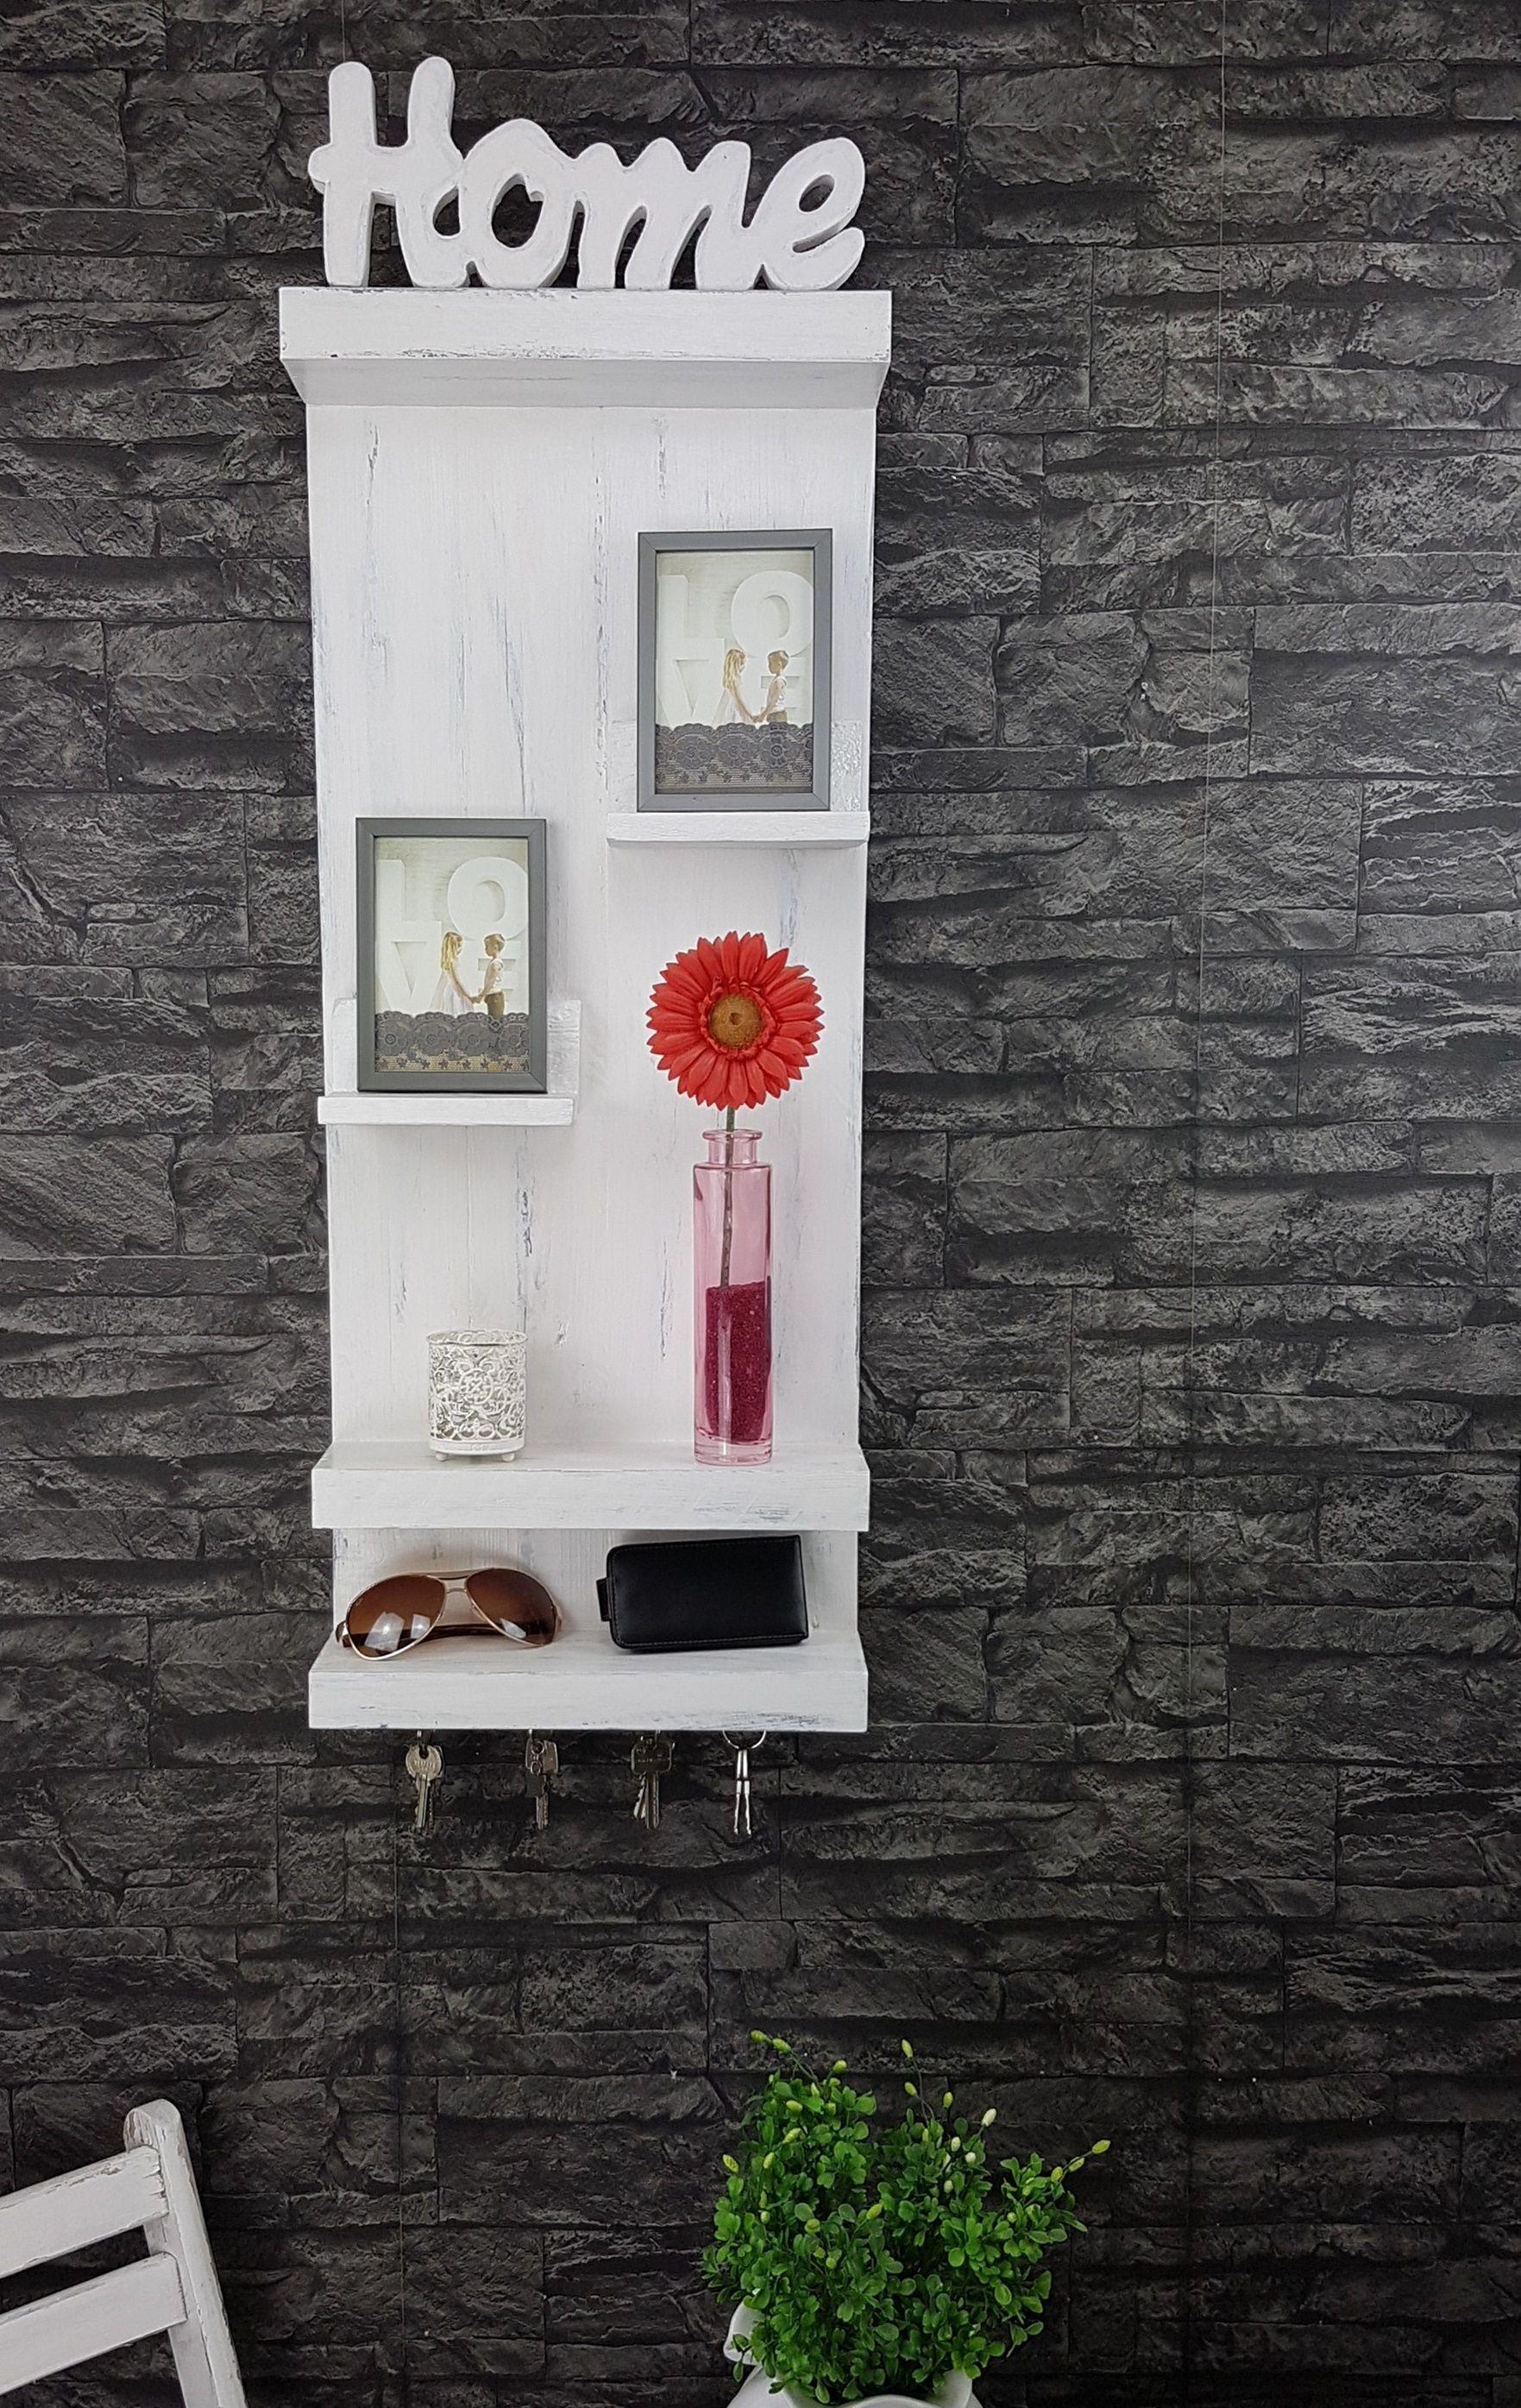 wandregal shabby look regale shelf pinterest wandregal regal und wandregal shabby. Black Bedroom Furniture Sets. Home Design Ideas